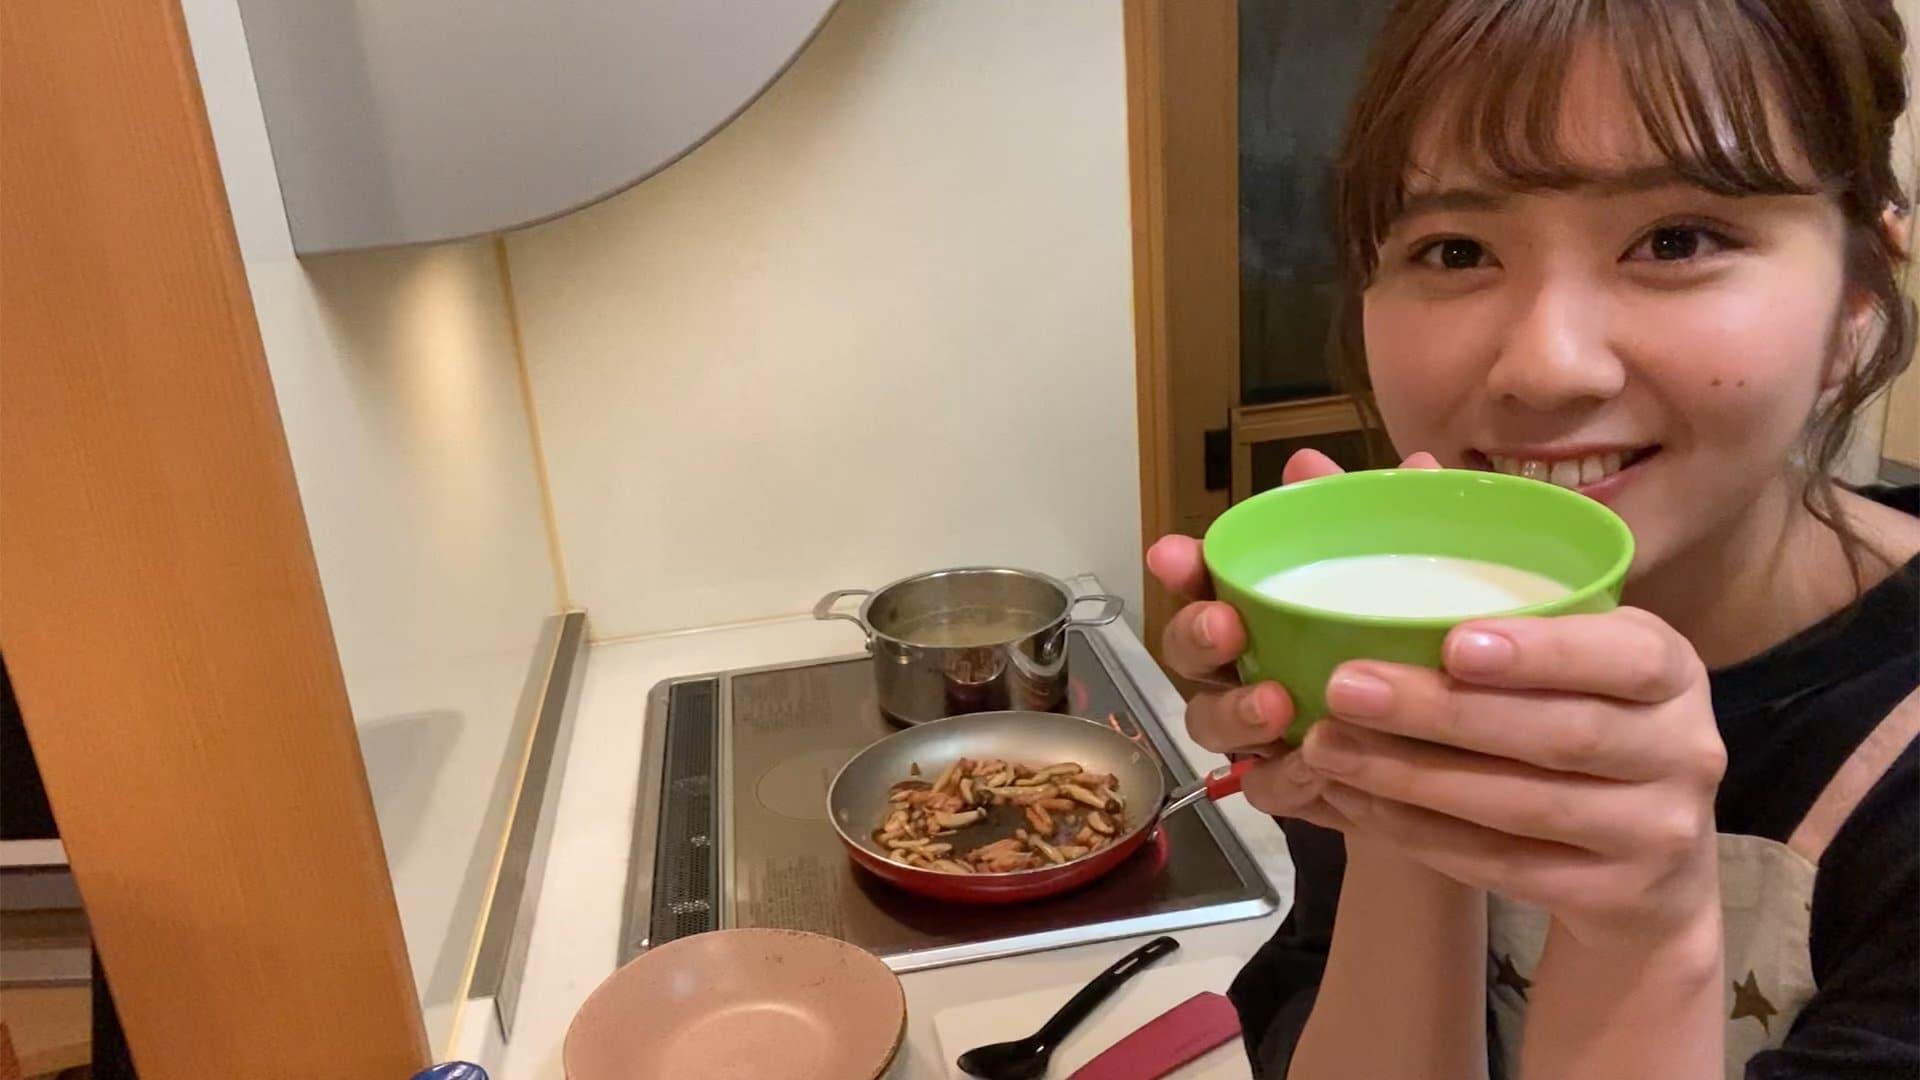 AKB48/OUC48プロジェクト×農林水産省日本の牛乳を救う新企画・緊急特番「OUC48のワンモ〜レシピ」配信スタート!【写真13枚】の画像004